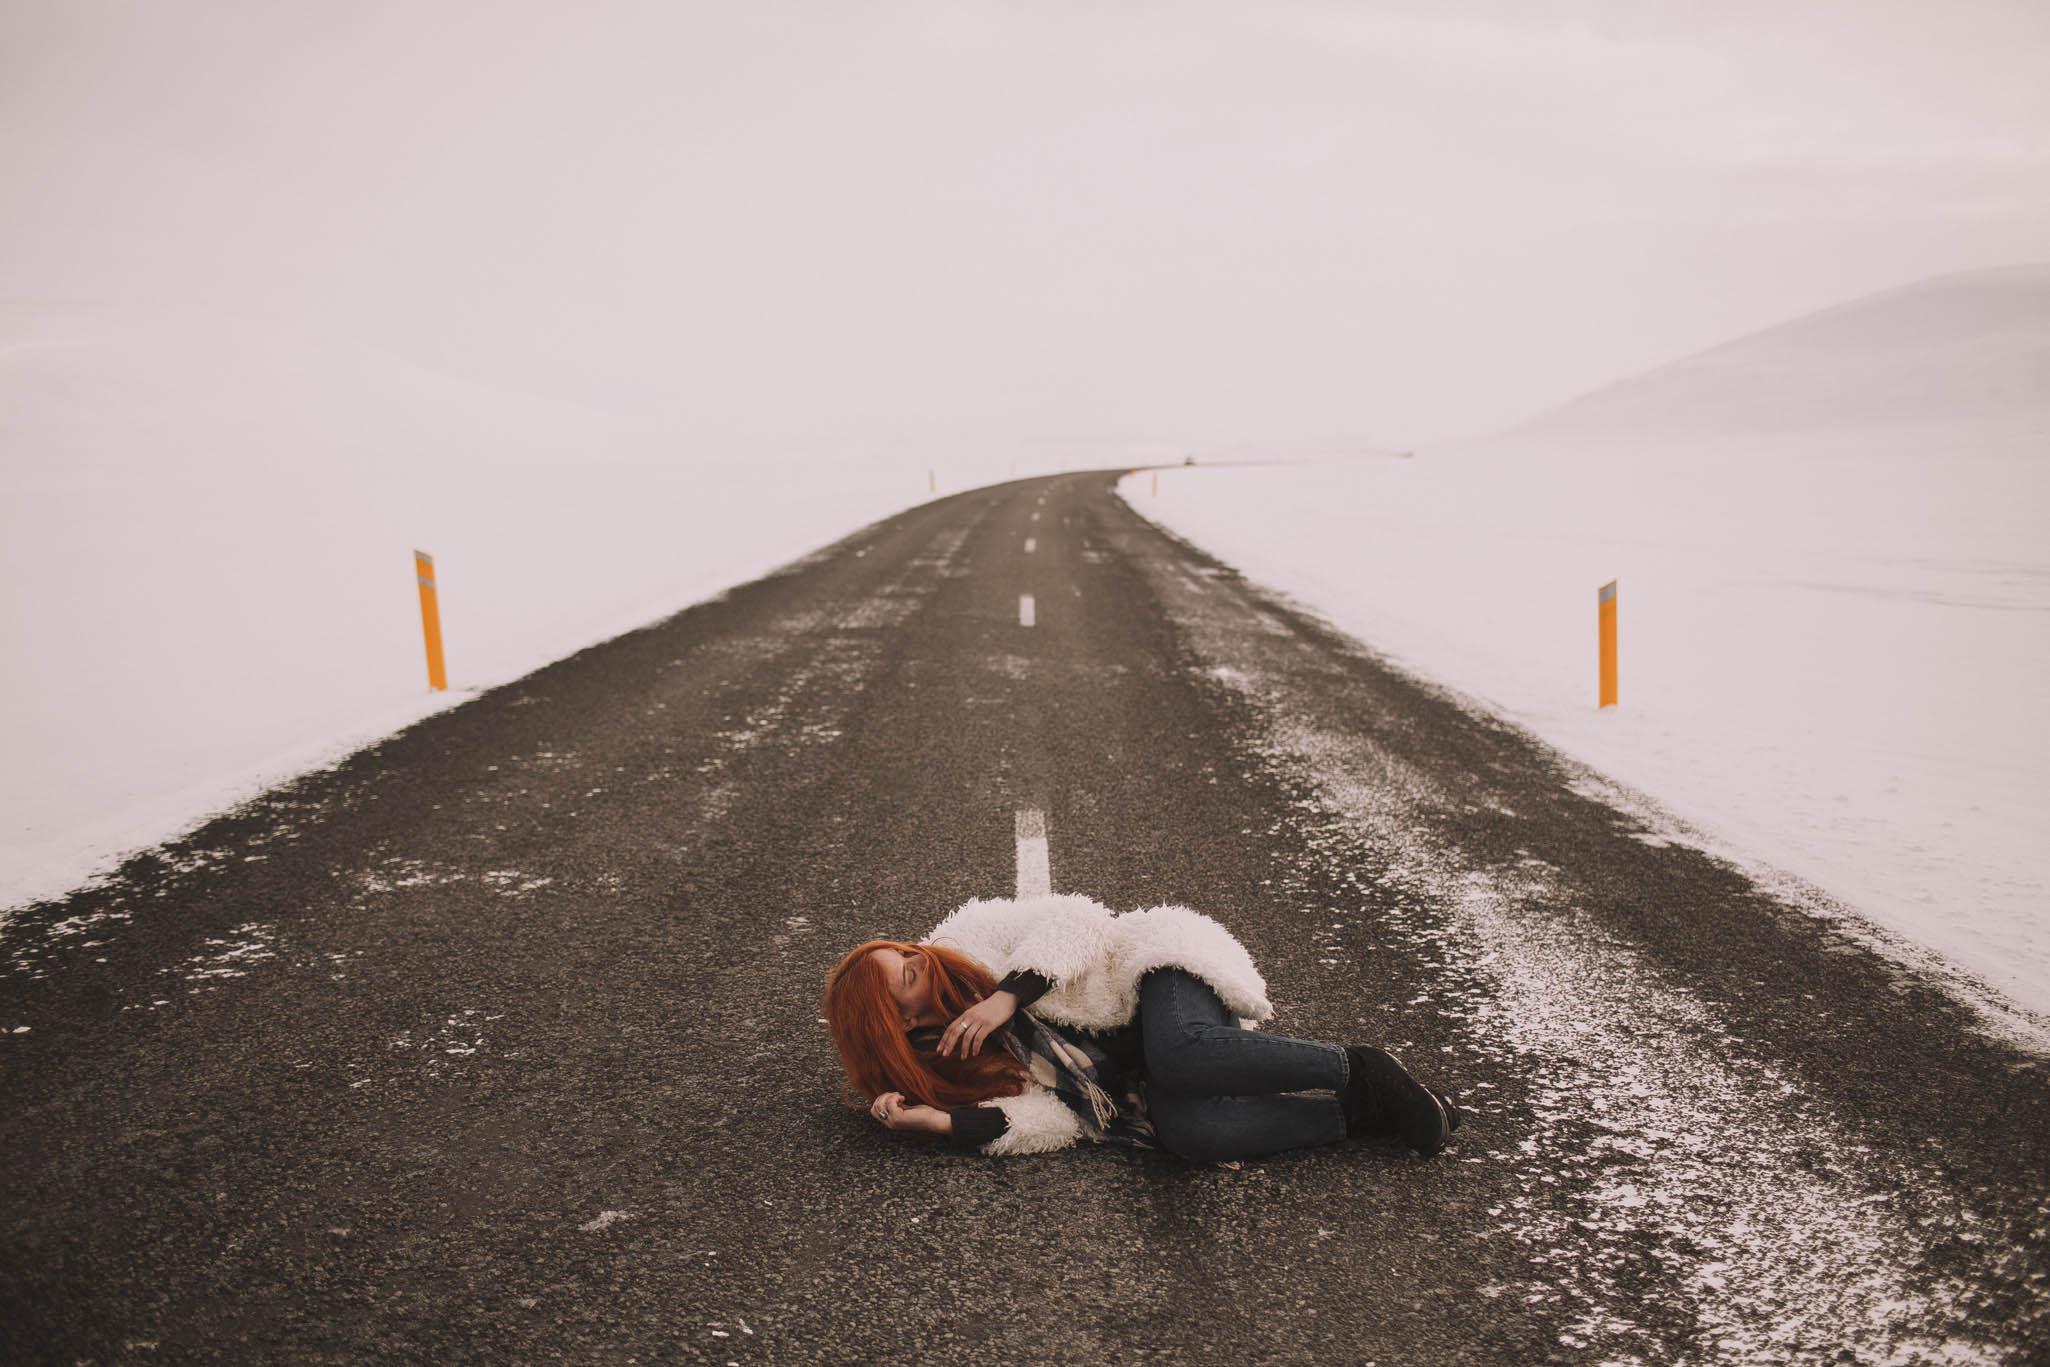 Road-trip-Islande-Iceland-Voyage-Travel-Portrait-Jérémy-Boyer-Hverir-Steam-mountains-montagnes-vapeur-7.jpg